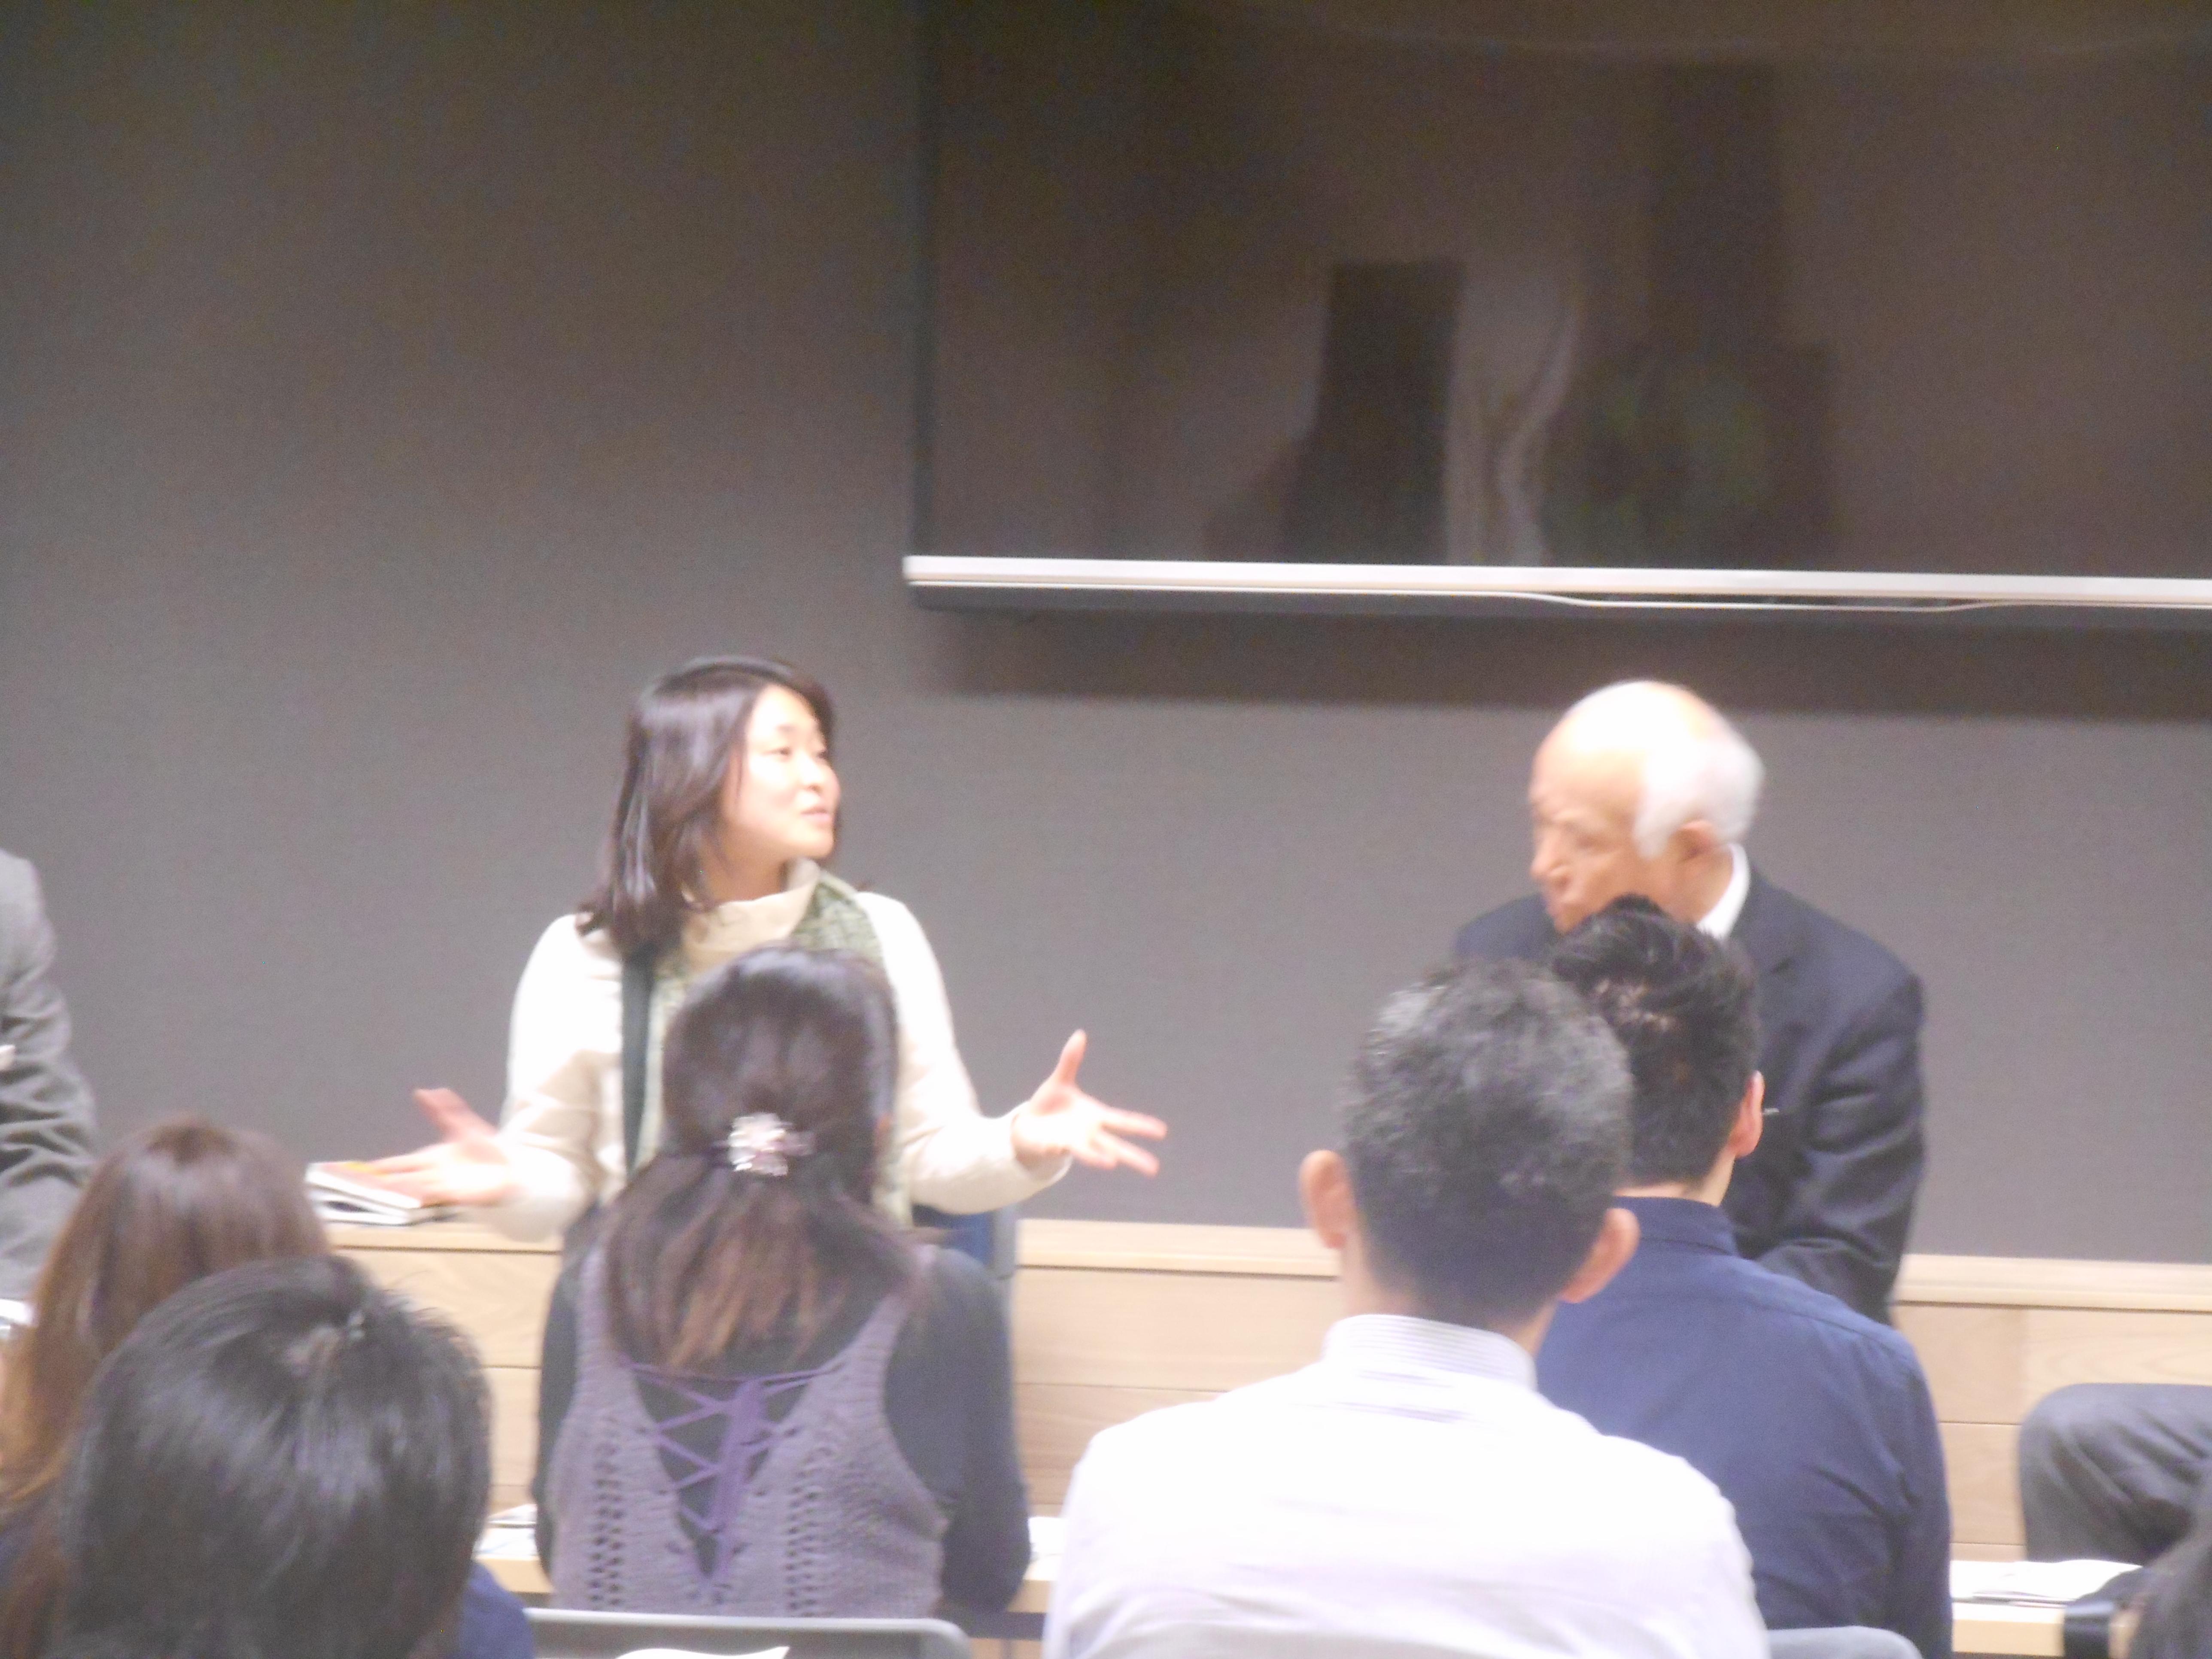 DSCN0501 - 2017年2月4日東京思風塾開催